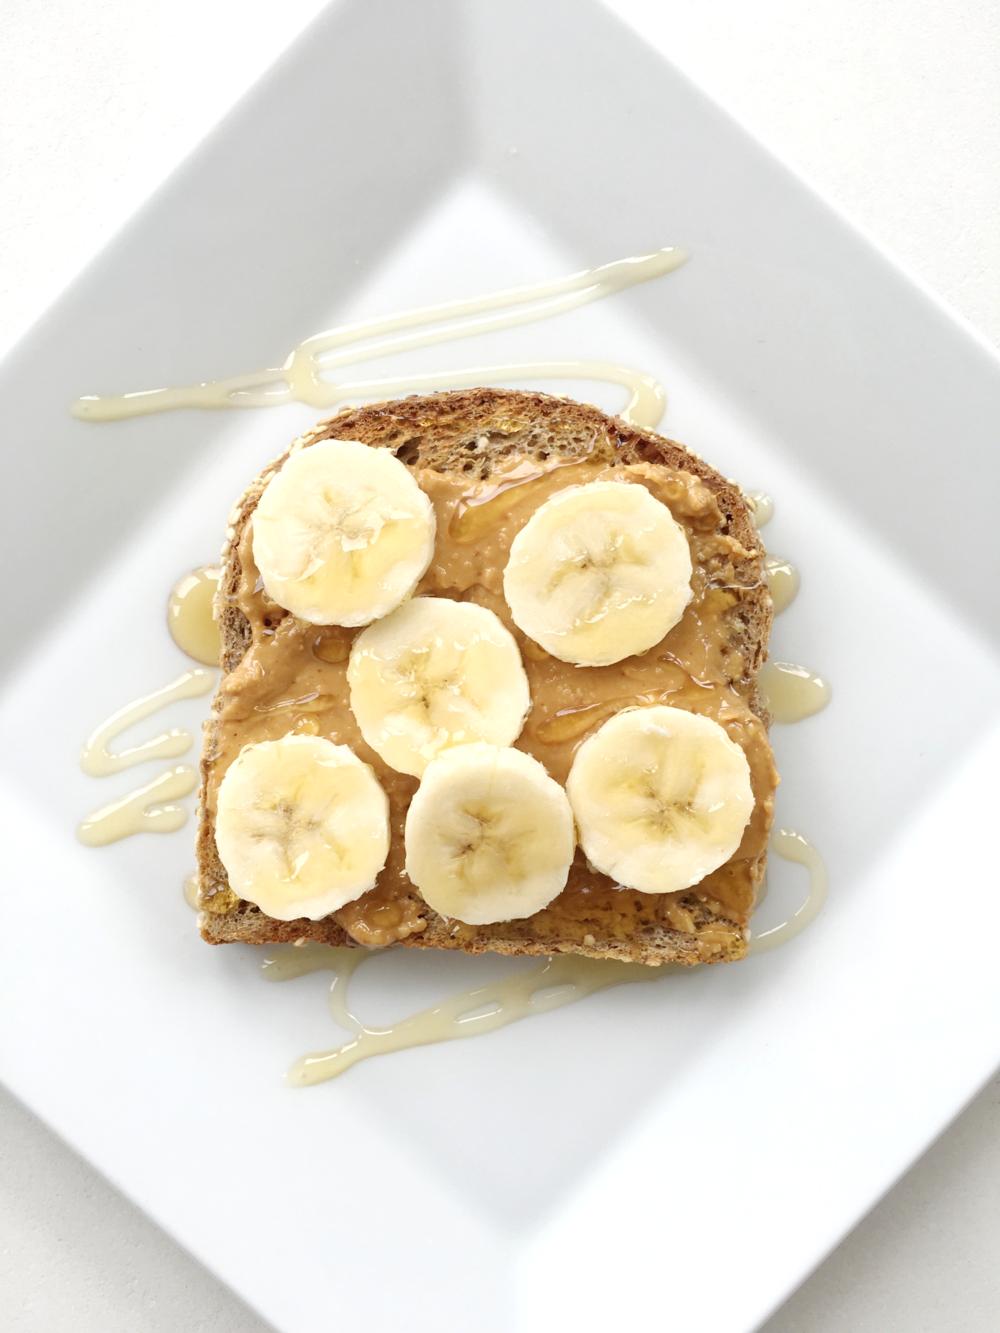 peanut butter + banana + honey